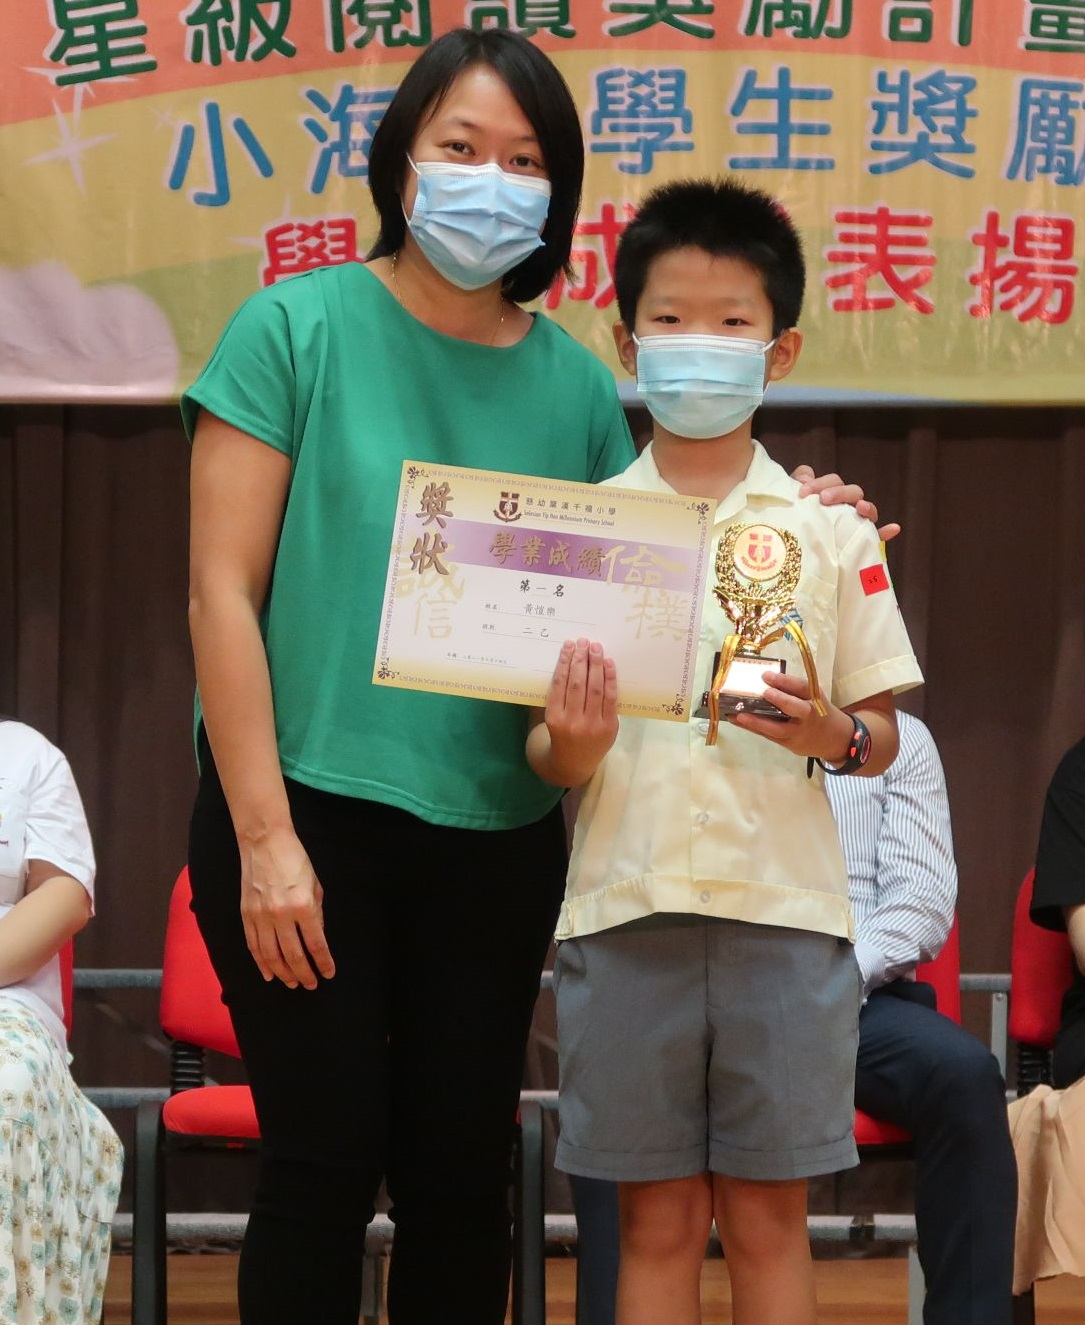 https://syh.edu.hk/sites/default/files/img_5402.jpg